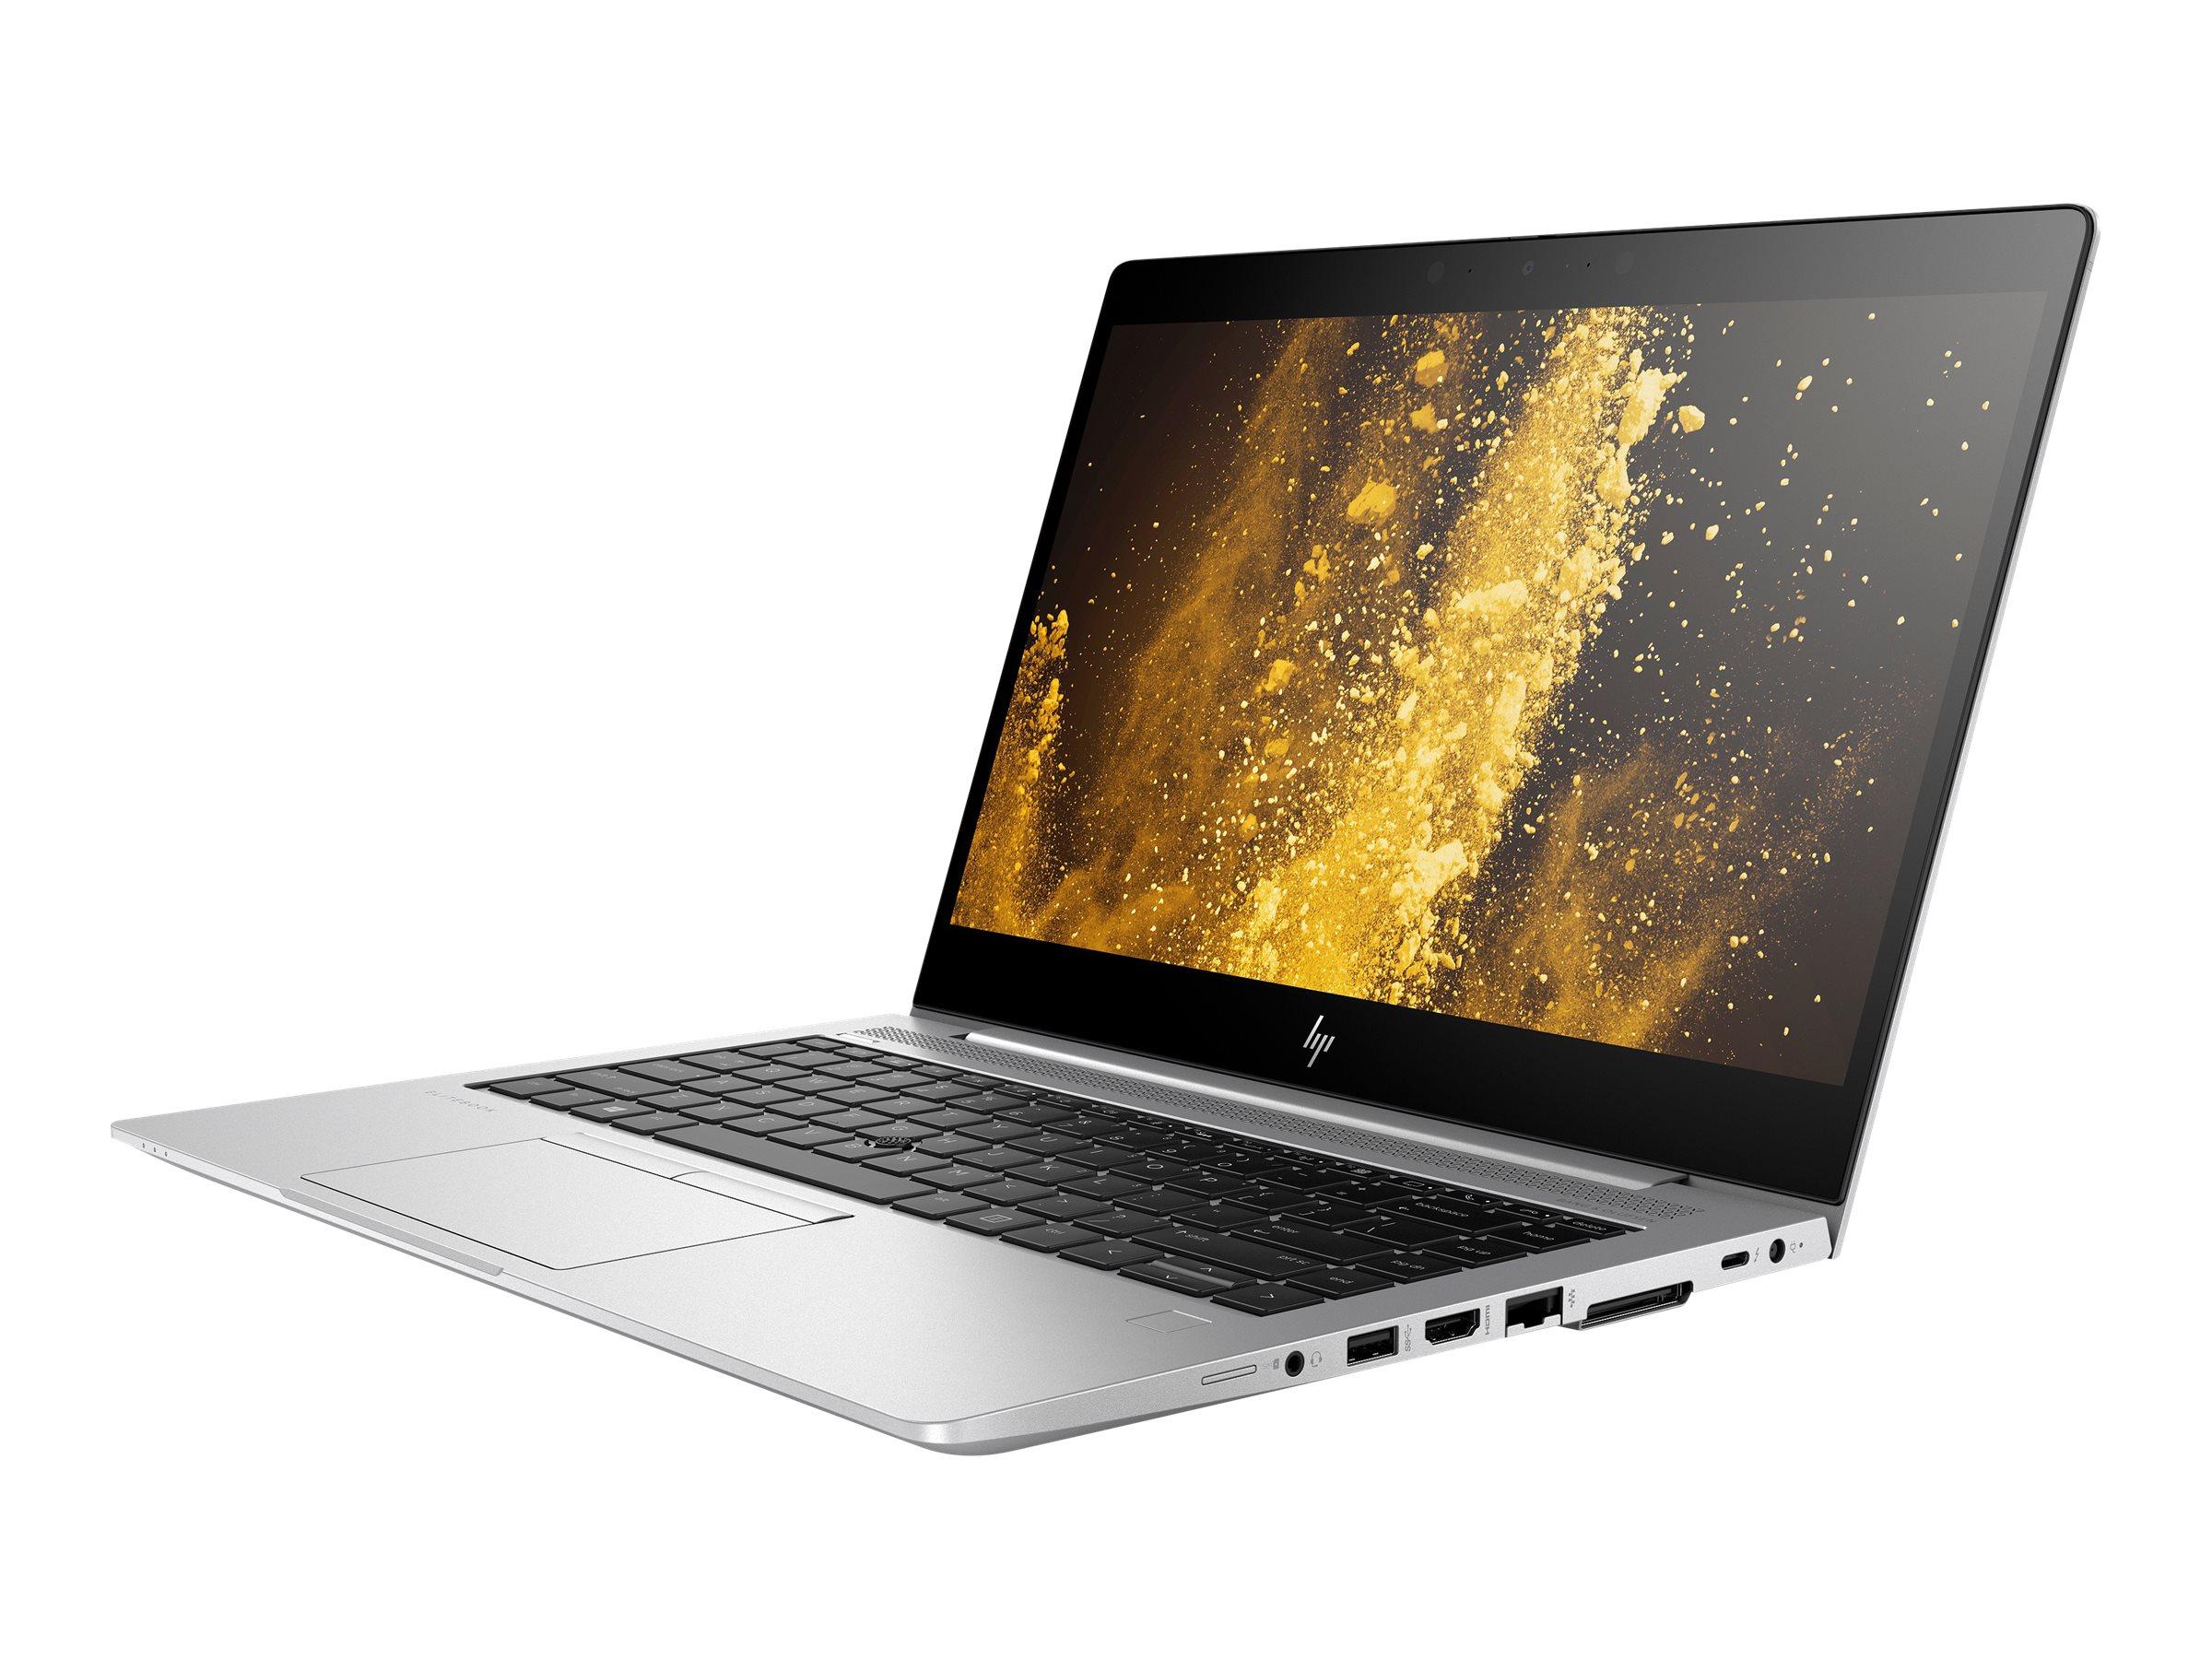 HP EliteBook 840 G6 - Core i7 8565U / 1.8 GHz - Win 10 Pro 64-Bit - 16 GB RAM - 512 GB SSD NVMe, HP Value - 35.56 cm (14